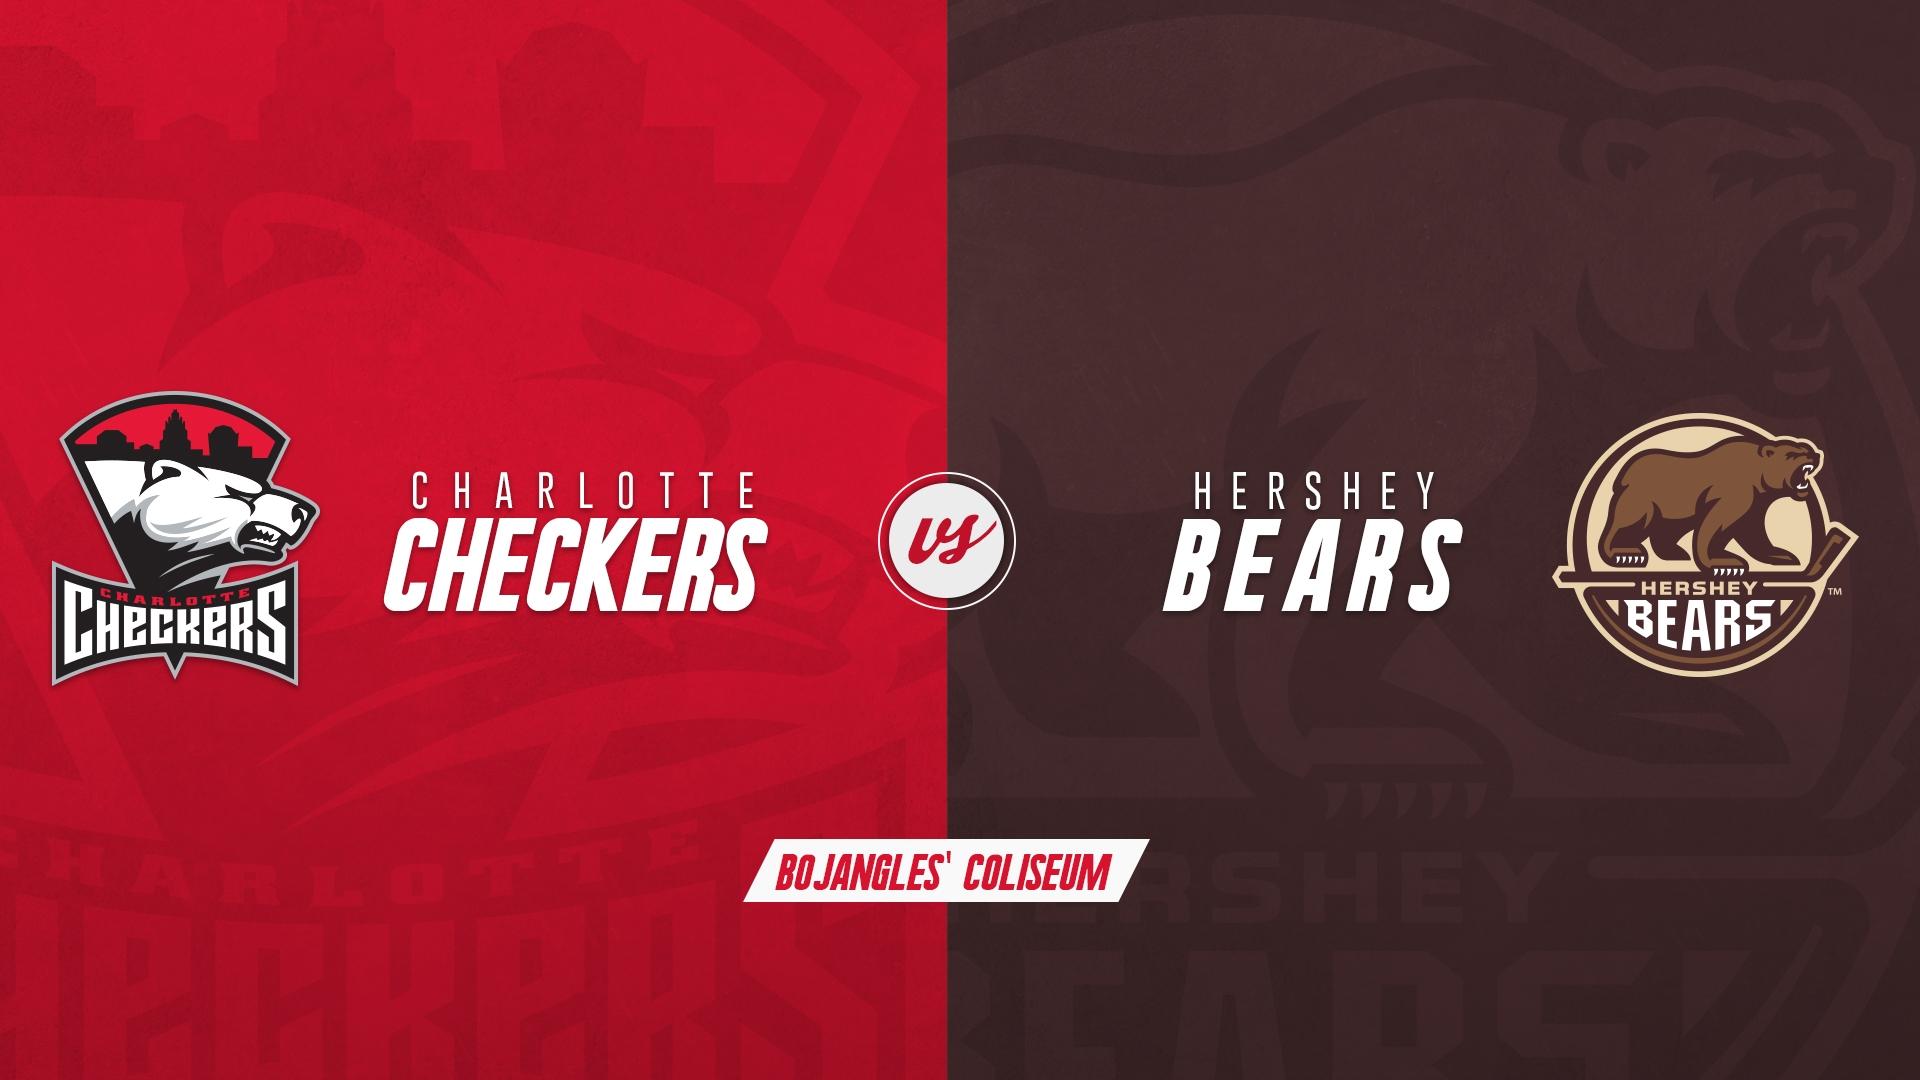 Charlotte Checkers vs. Hershey Bears - SUSPENDED